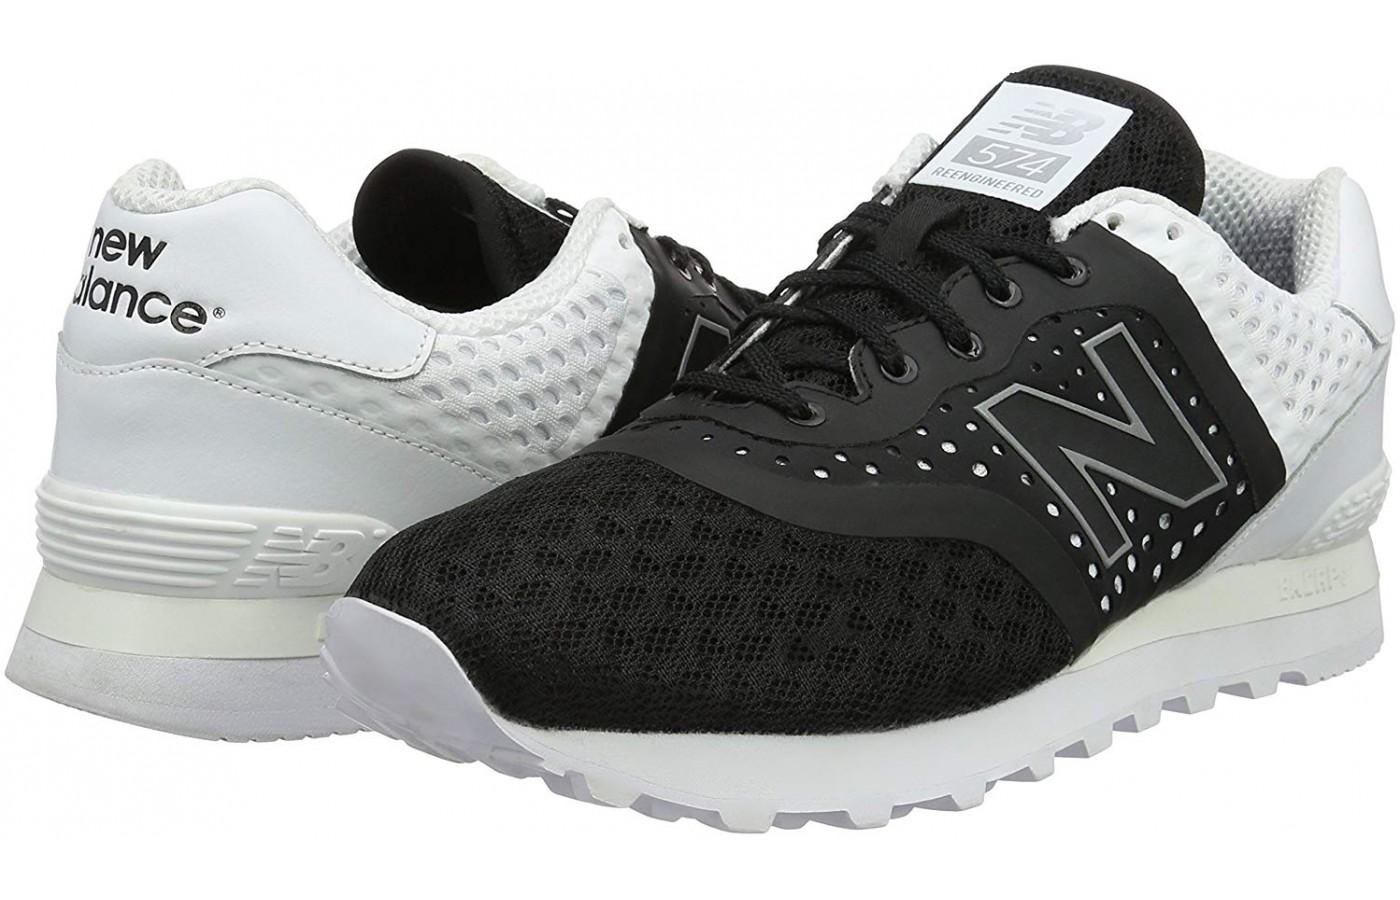 New Balance 574 pair